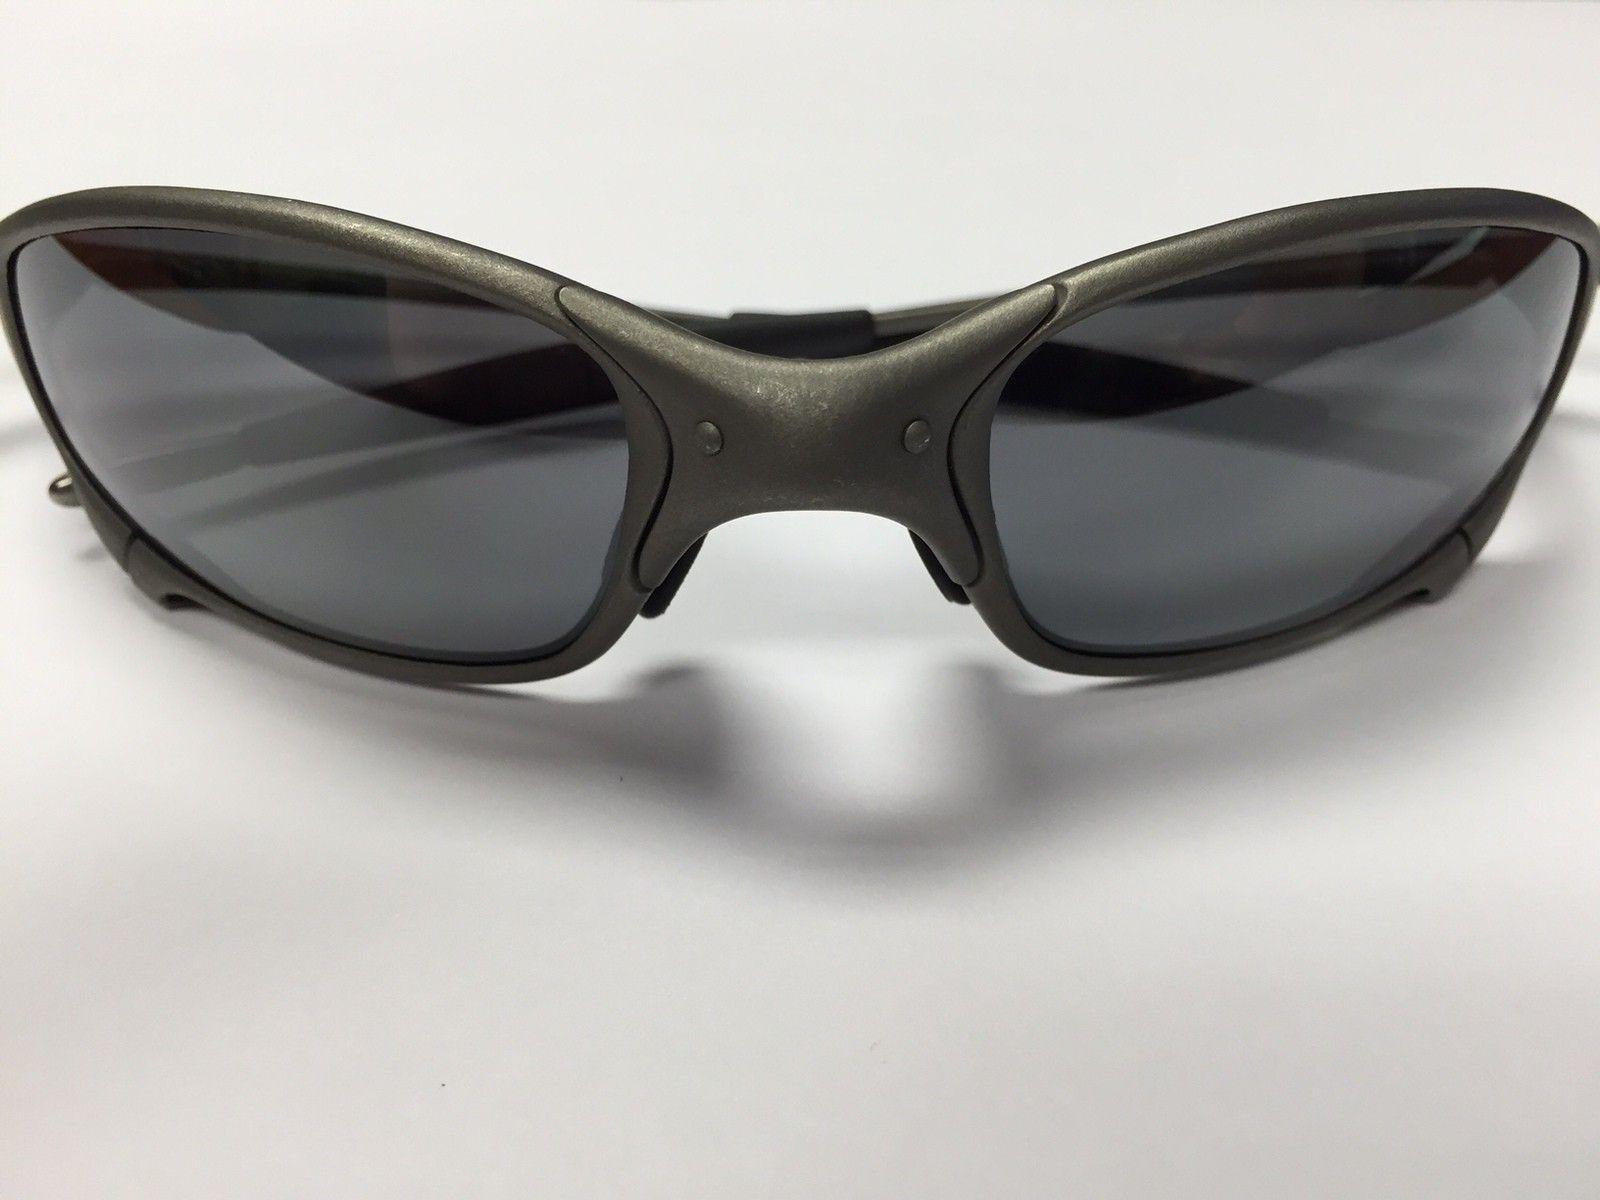 8d7cff678a7 Oakley Floating Sunglasses Strap « Heritage Malta